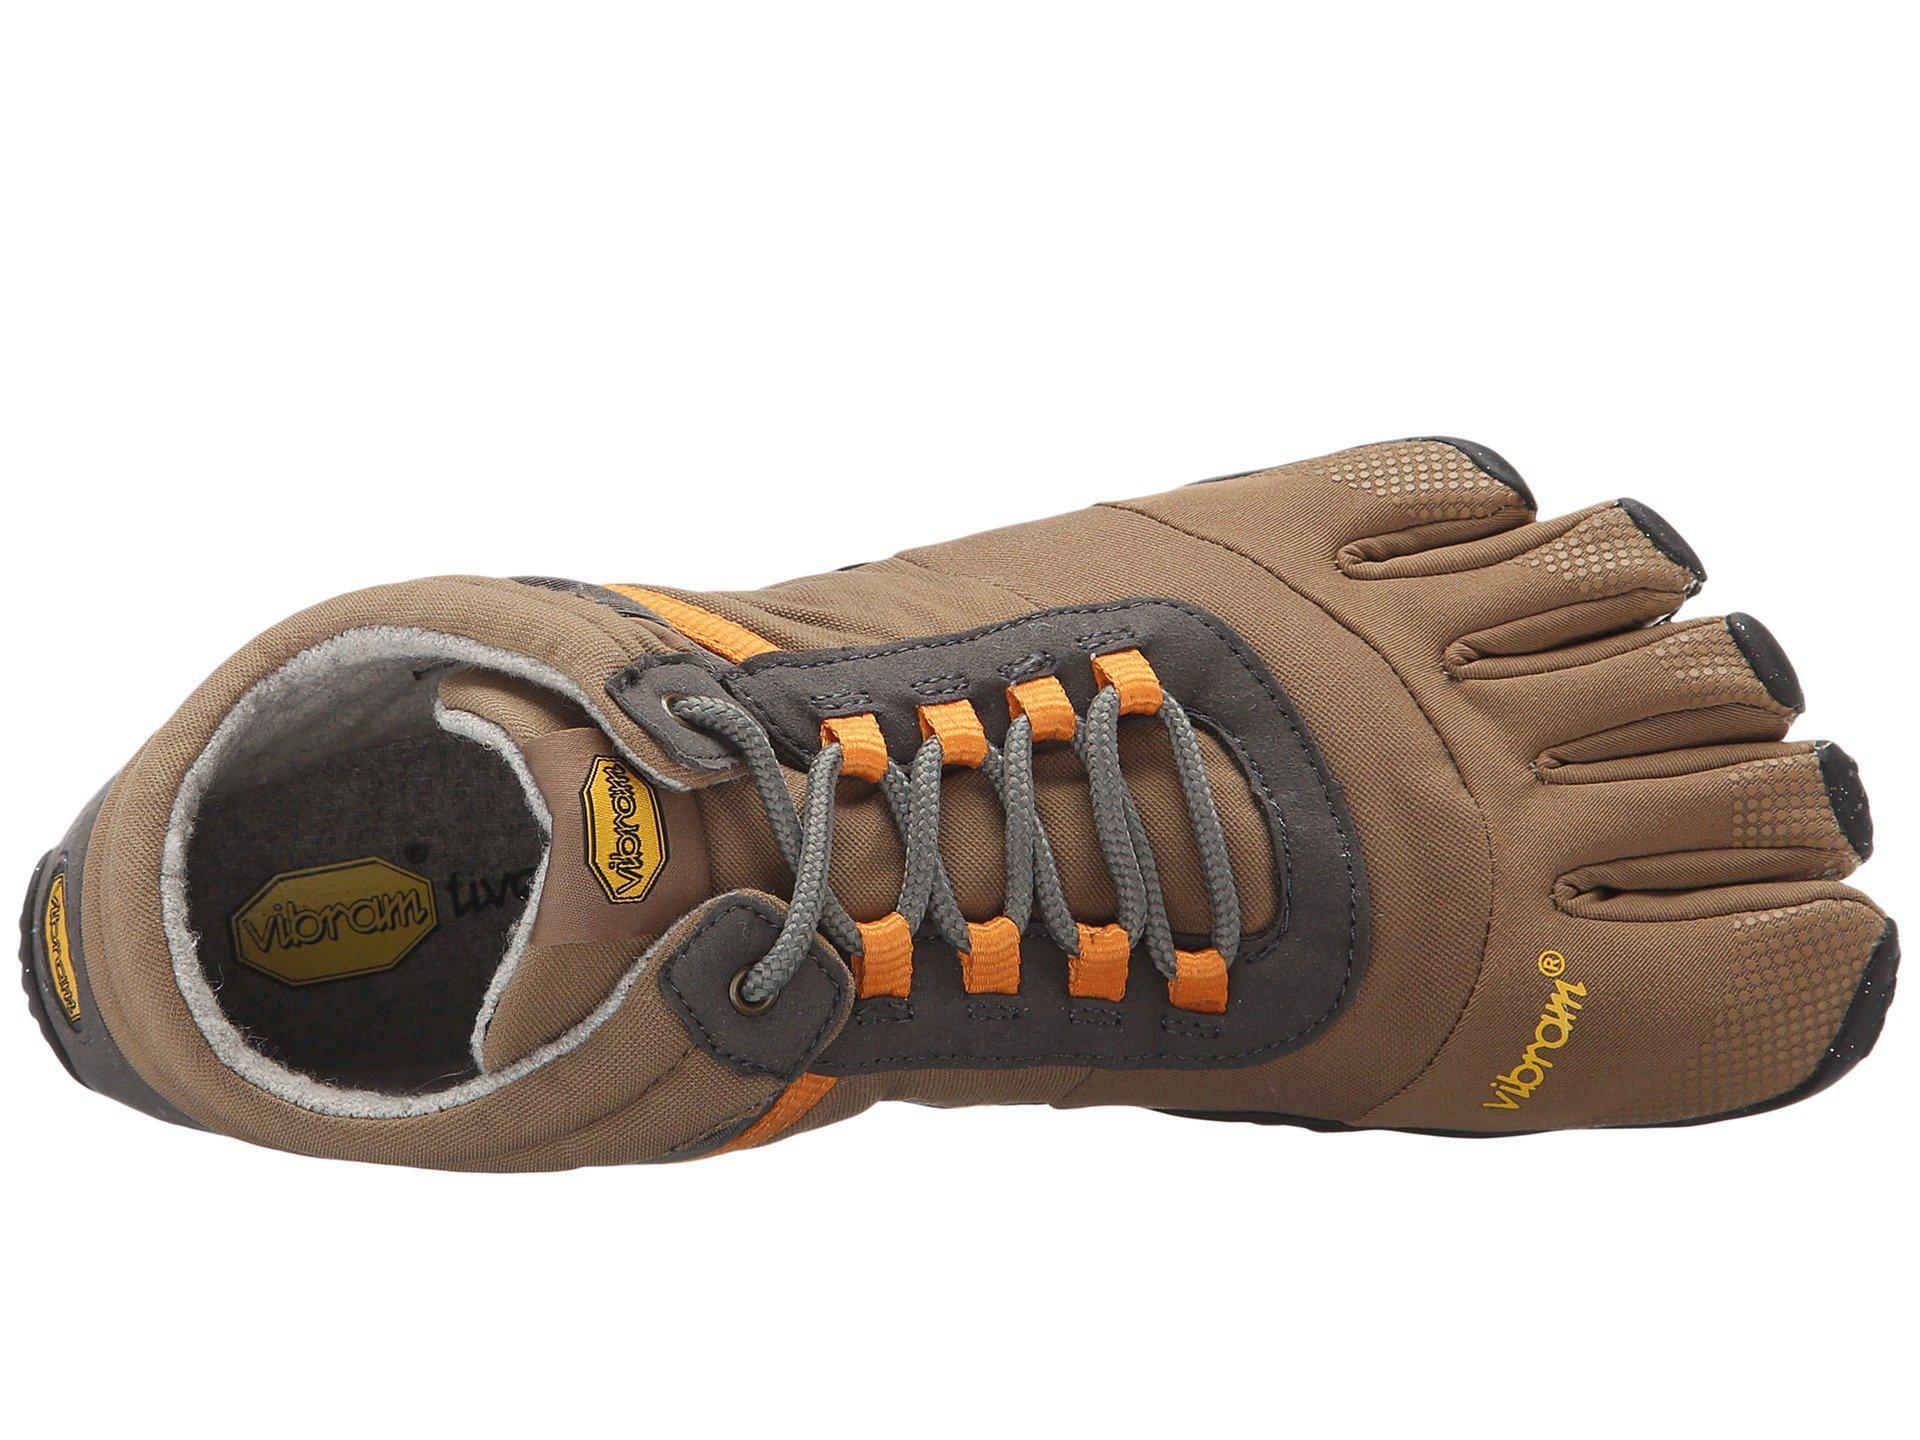 5da59d57793e Vibram Fivefingers - Gray Trek Ascent (insulated Black) Men s Shoes for Men  - Lyst. View fullscreen